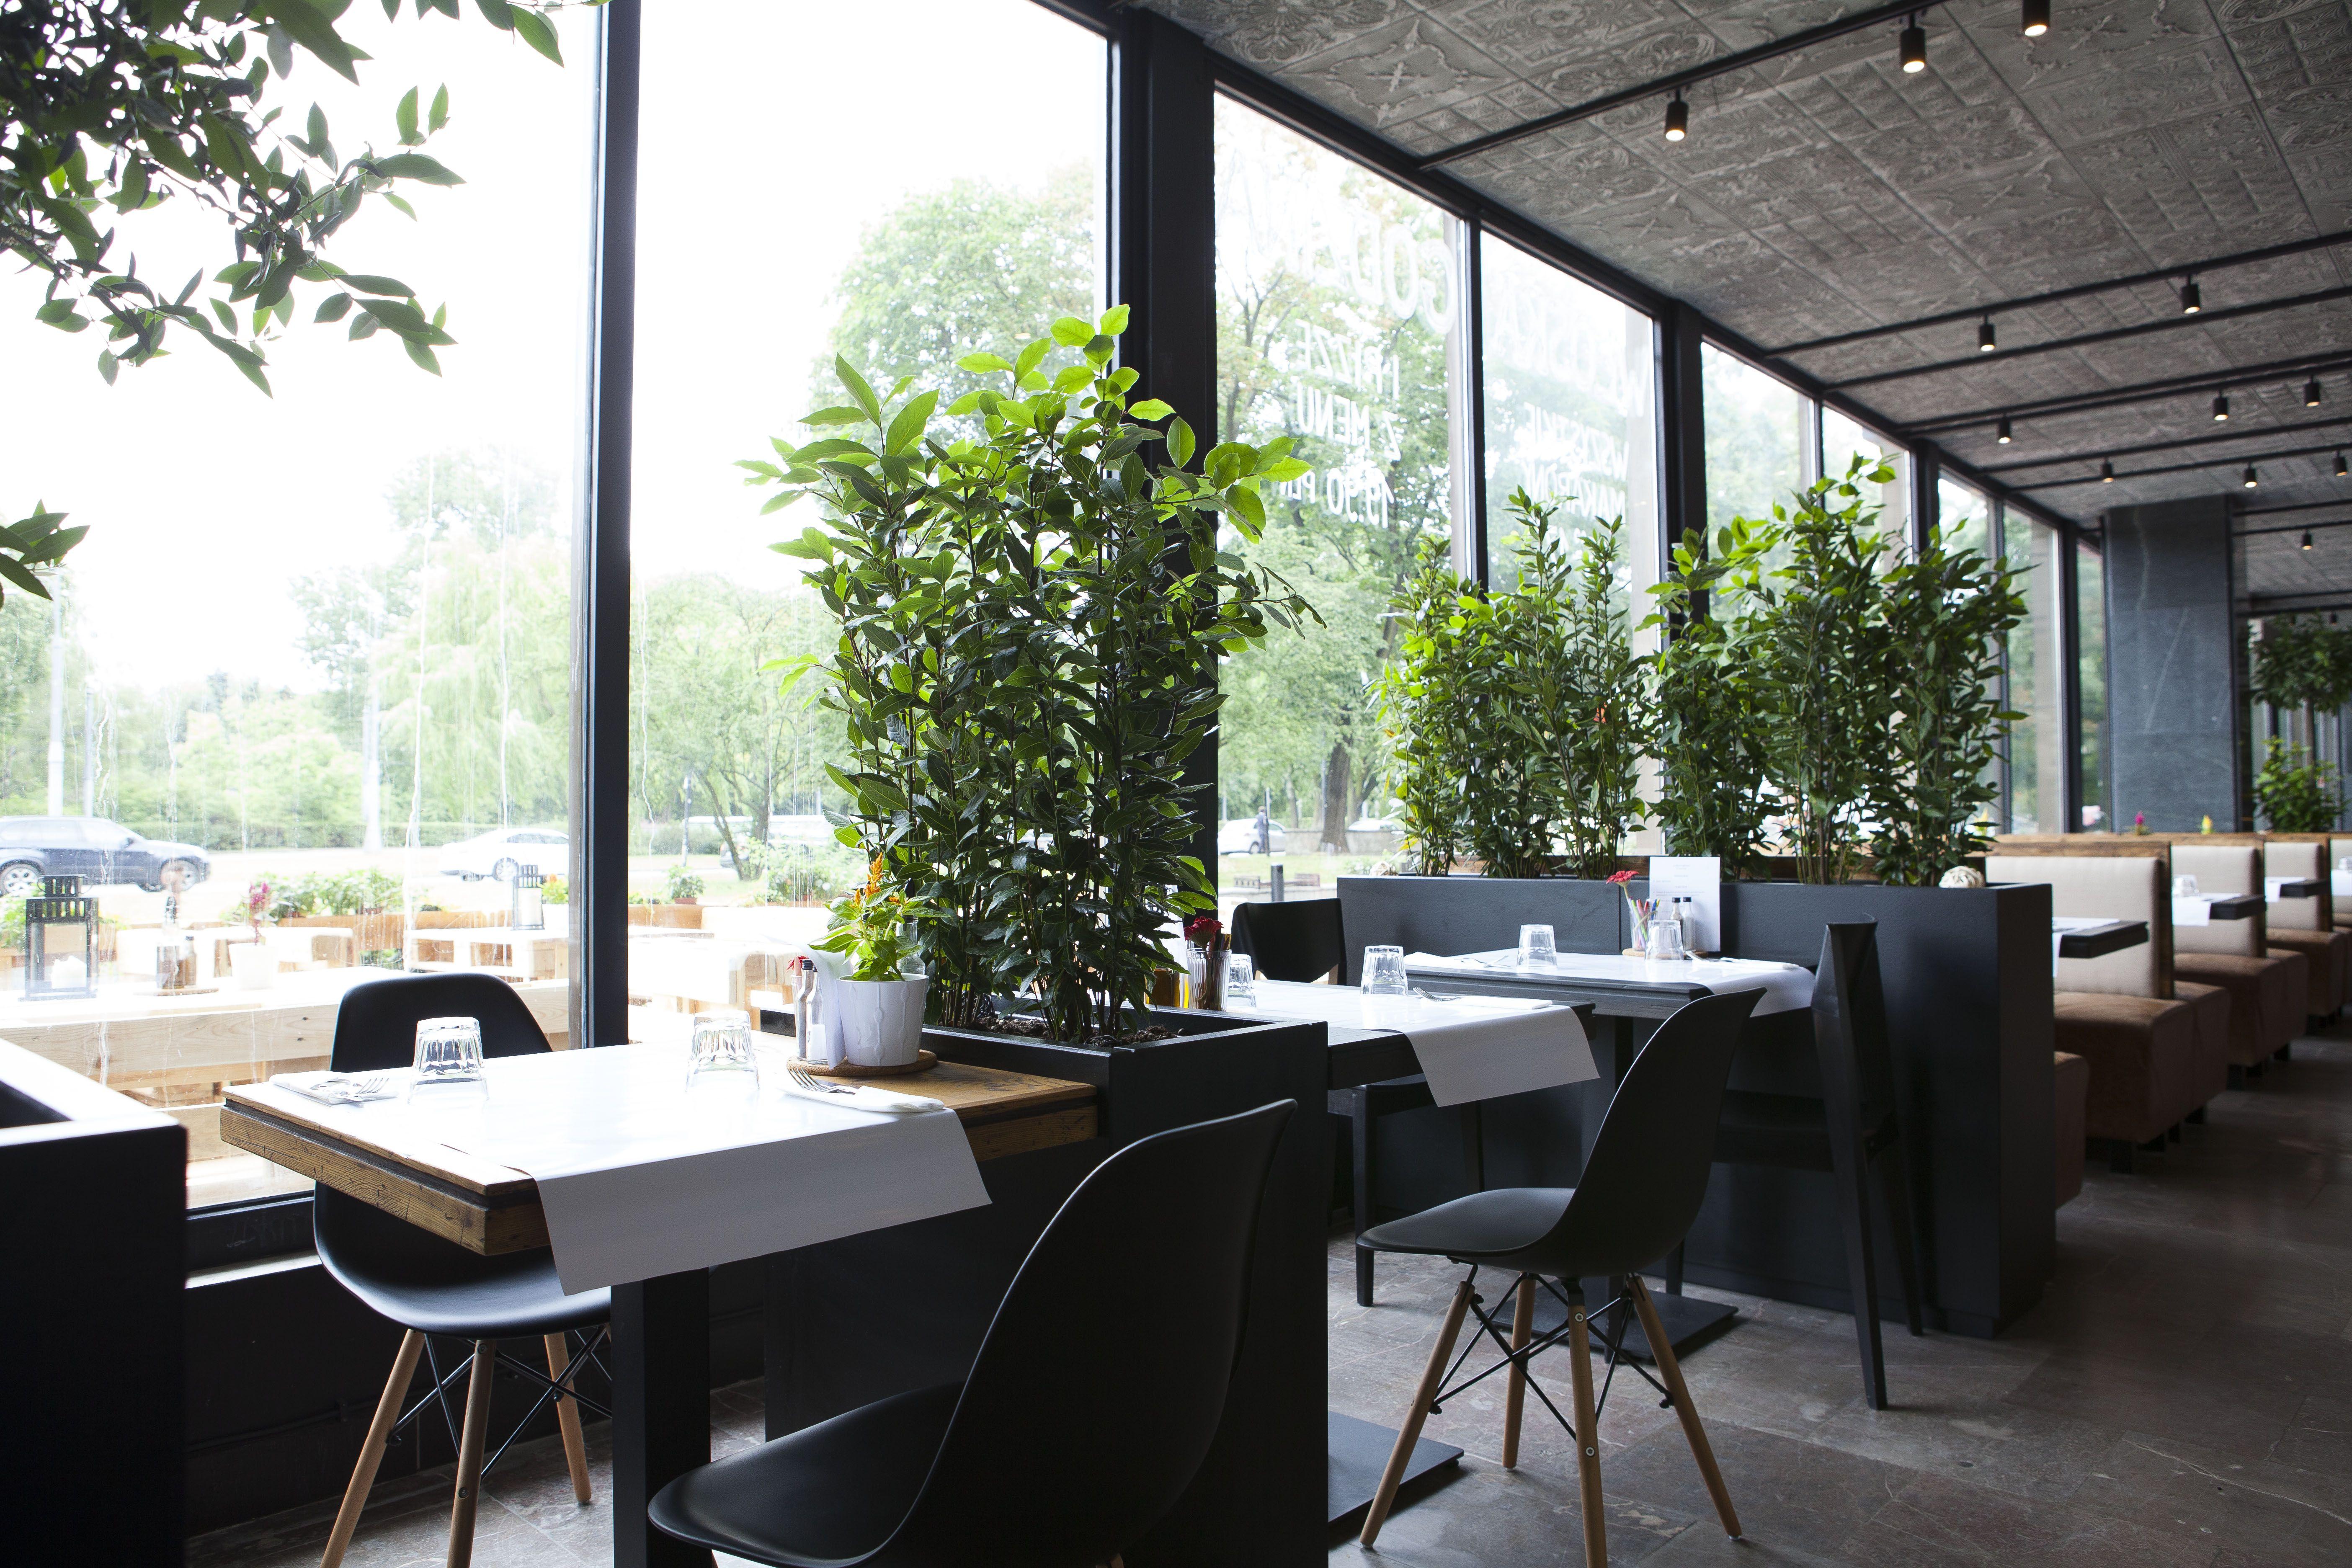 Restauracja Si Si Ristorante Amp Coctail Bar Si Restauracje Warszawa Restauracja Plac Bankowy Wloska Restauracja Pizza Swieze Ma Home Decor Decor Home